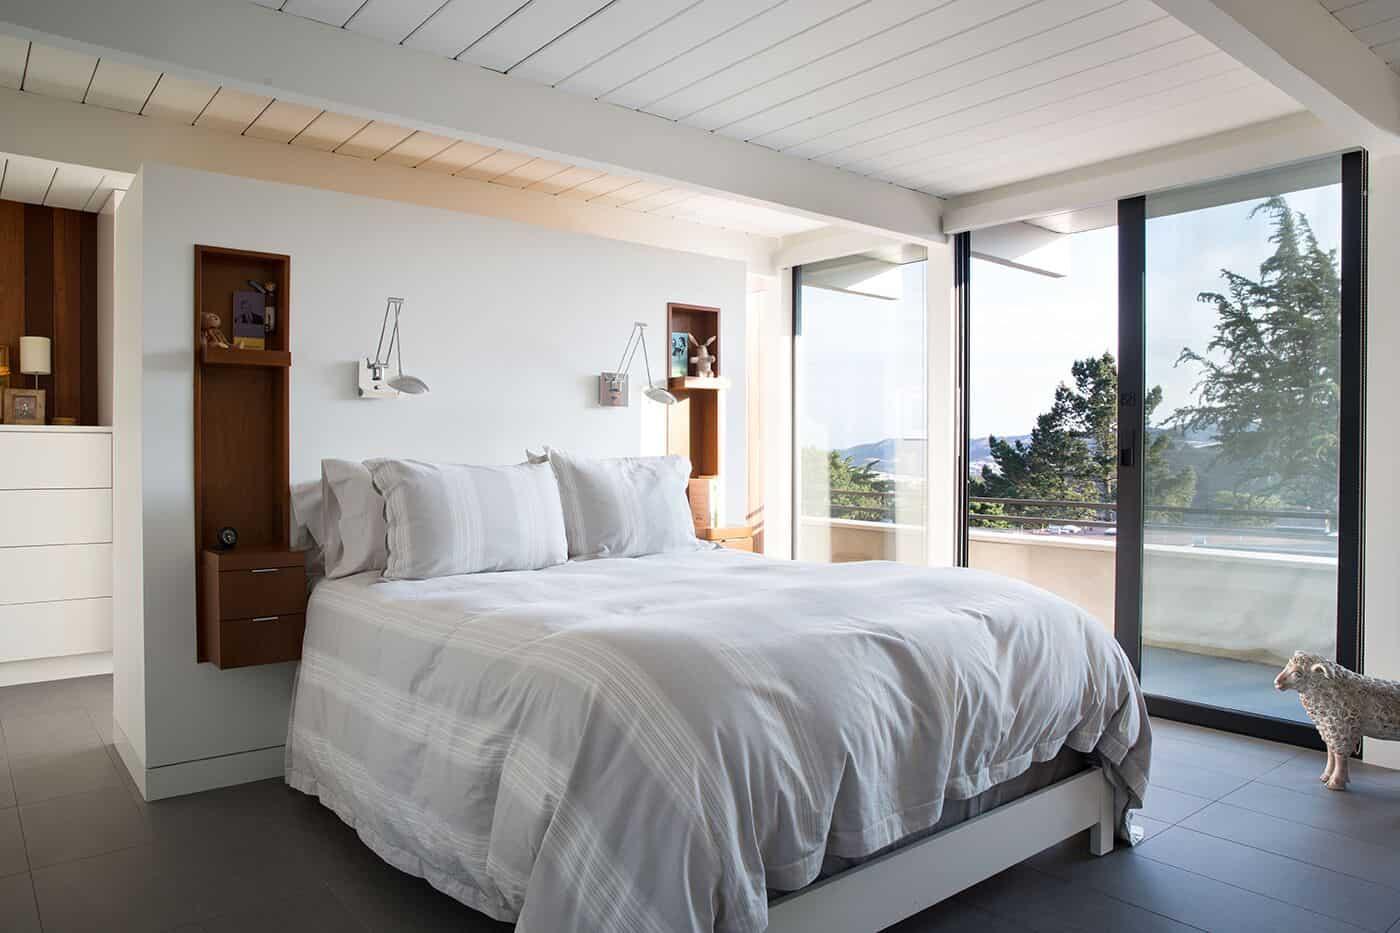 San Francisco Eichler Remodel-Klopf Architecture-12-1 Kindesign